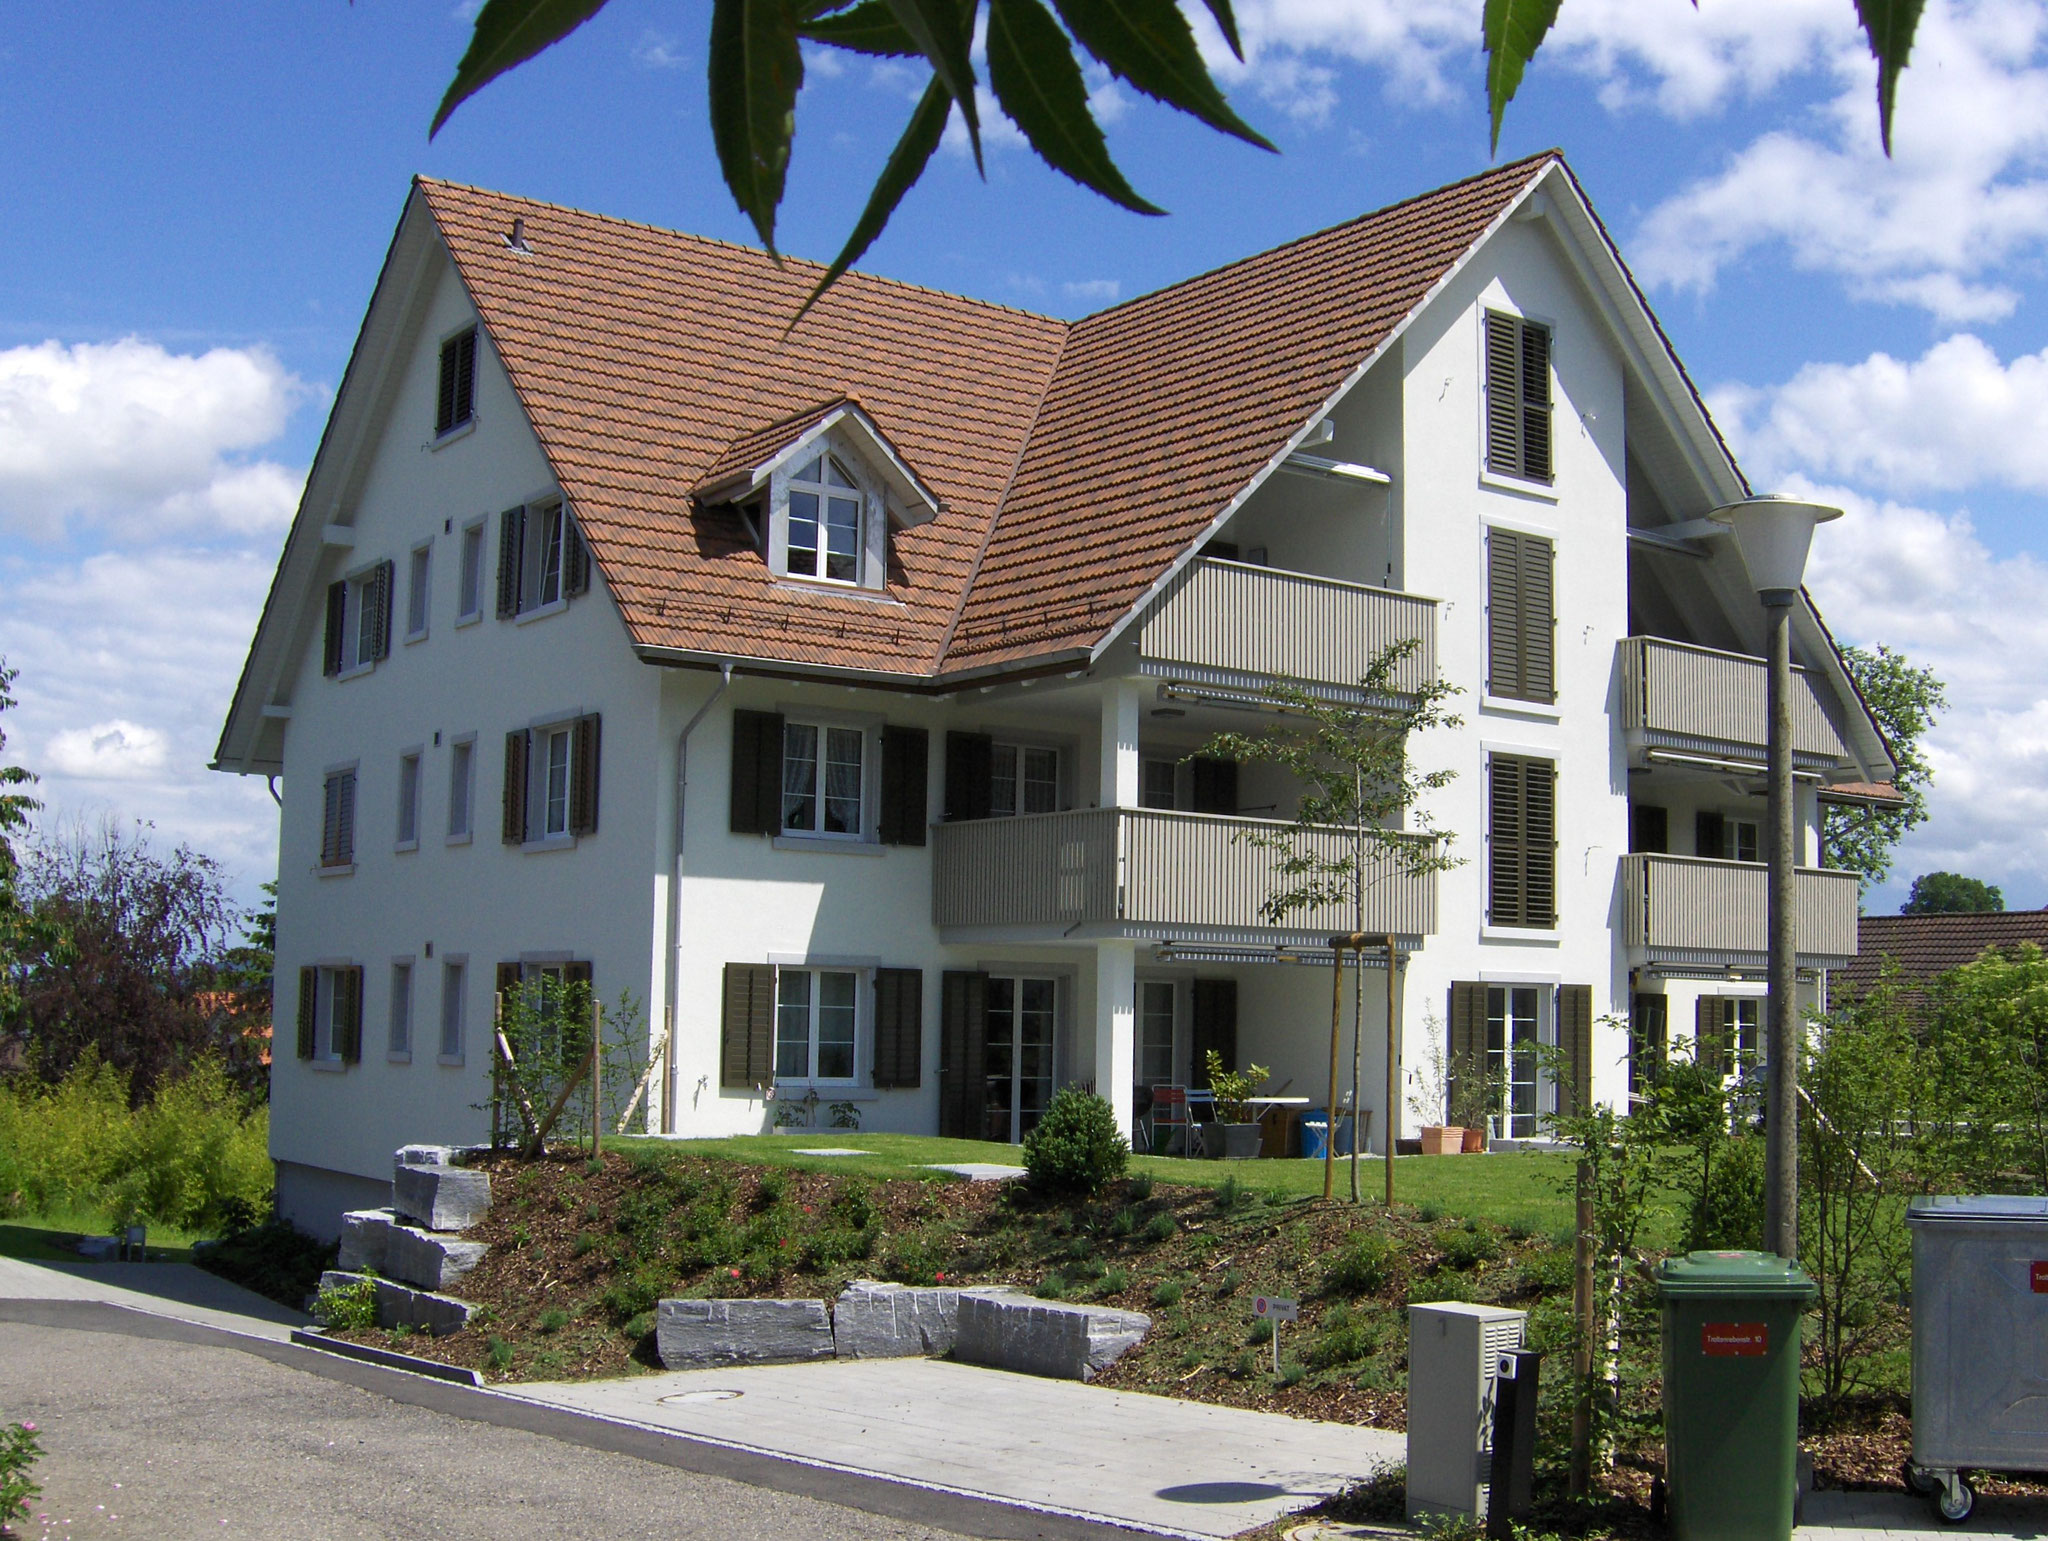 Mehrfamilienhaus, 8548 Ellikon an der Thur/ZH